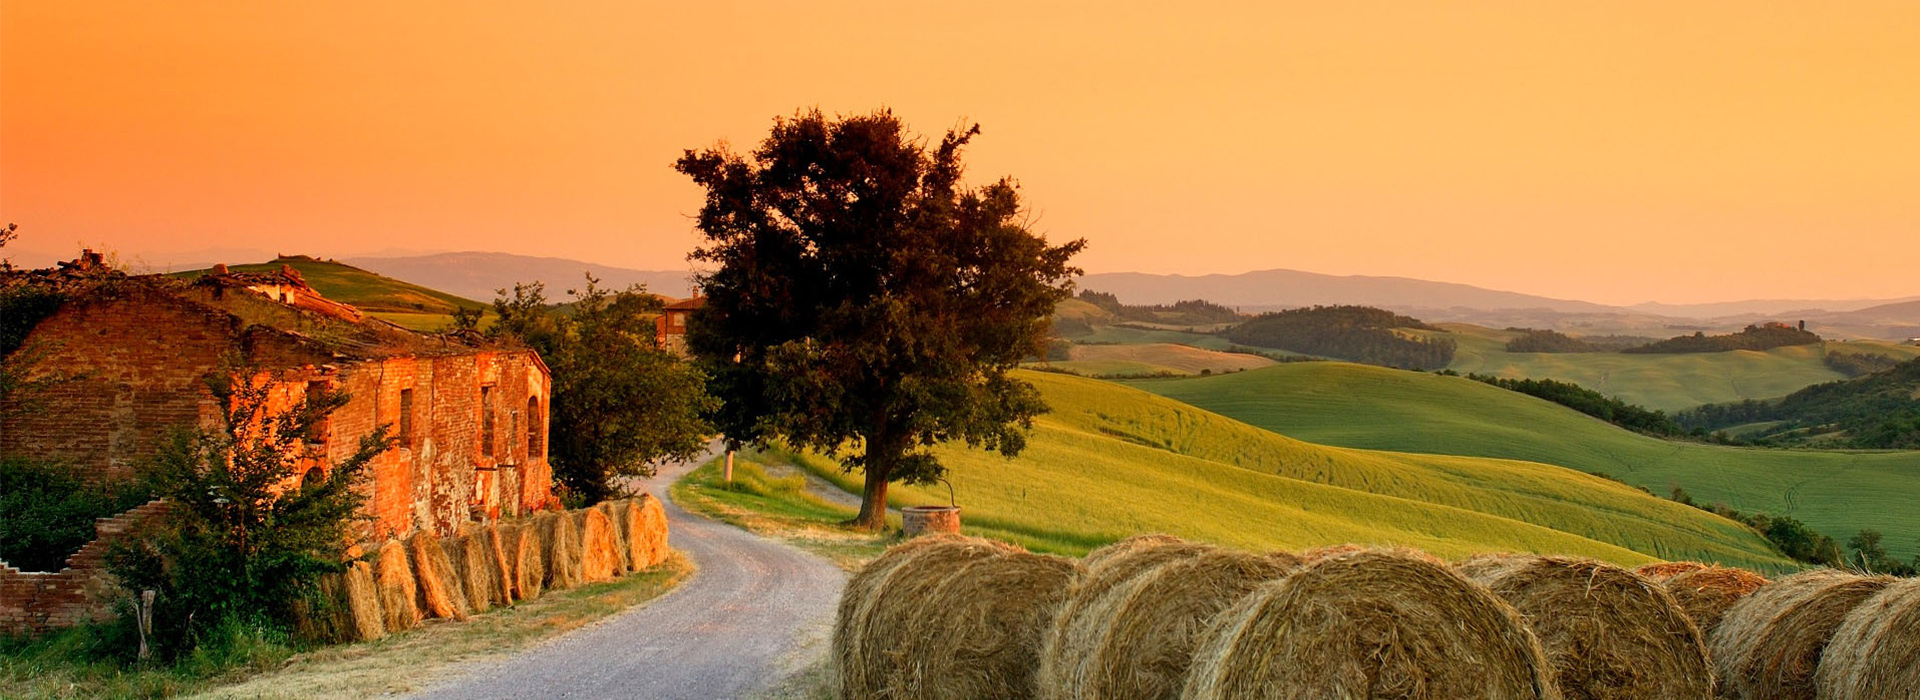 Tuscany Hay Barrels & Meadow